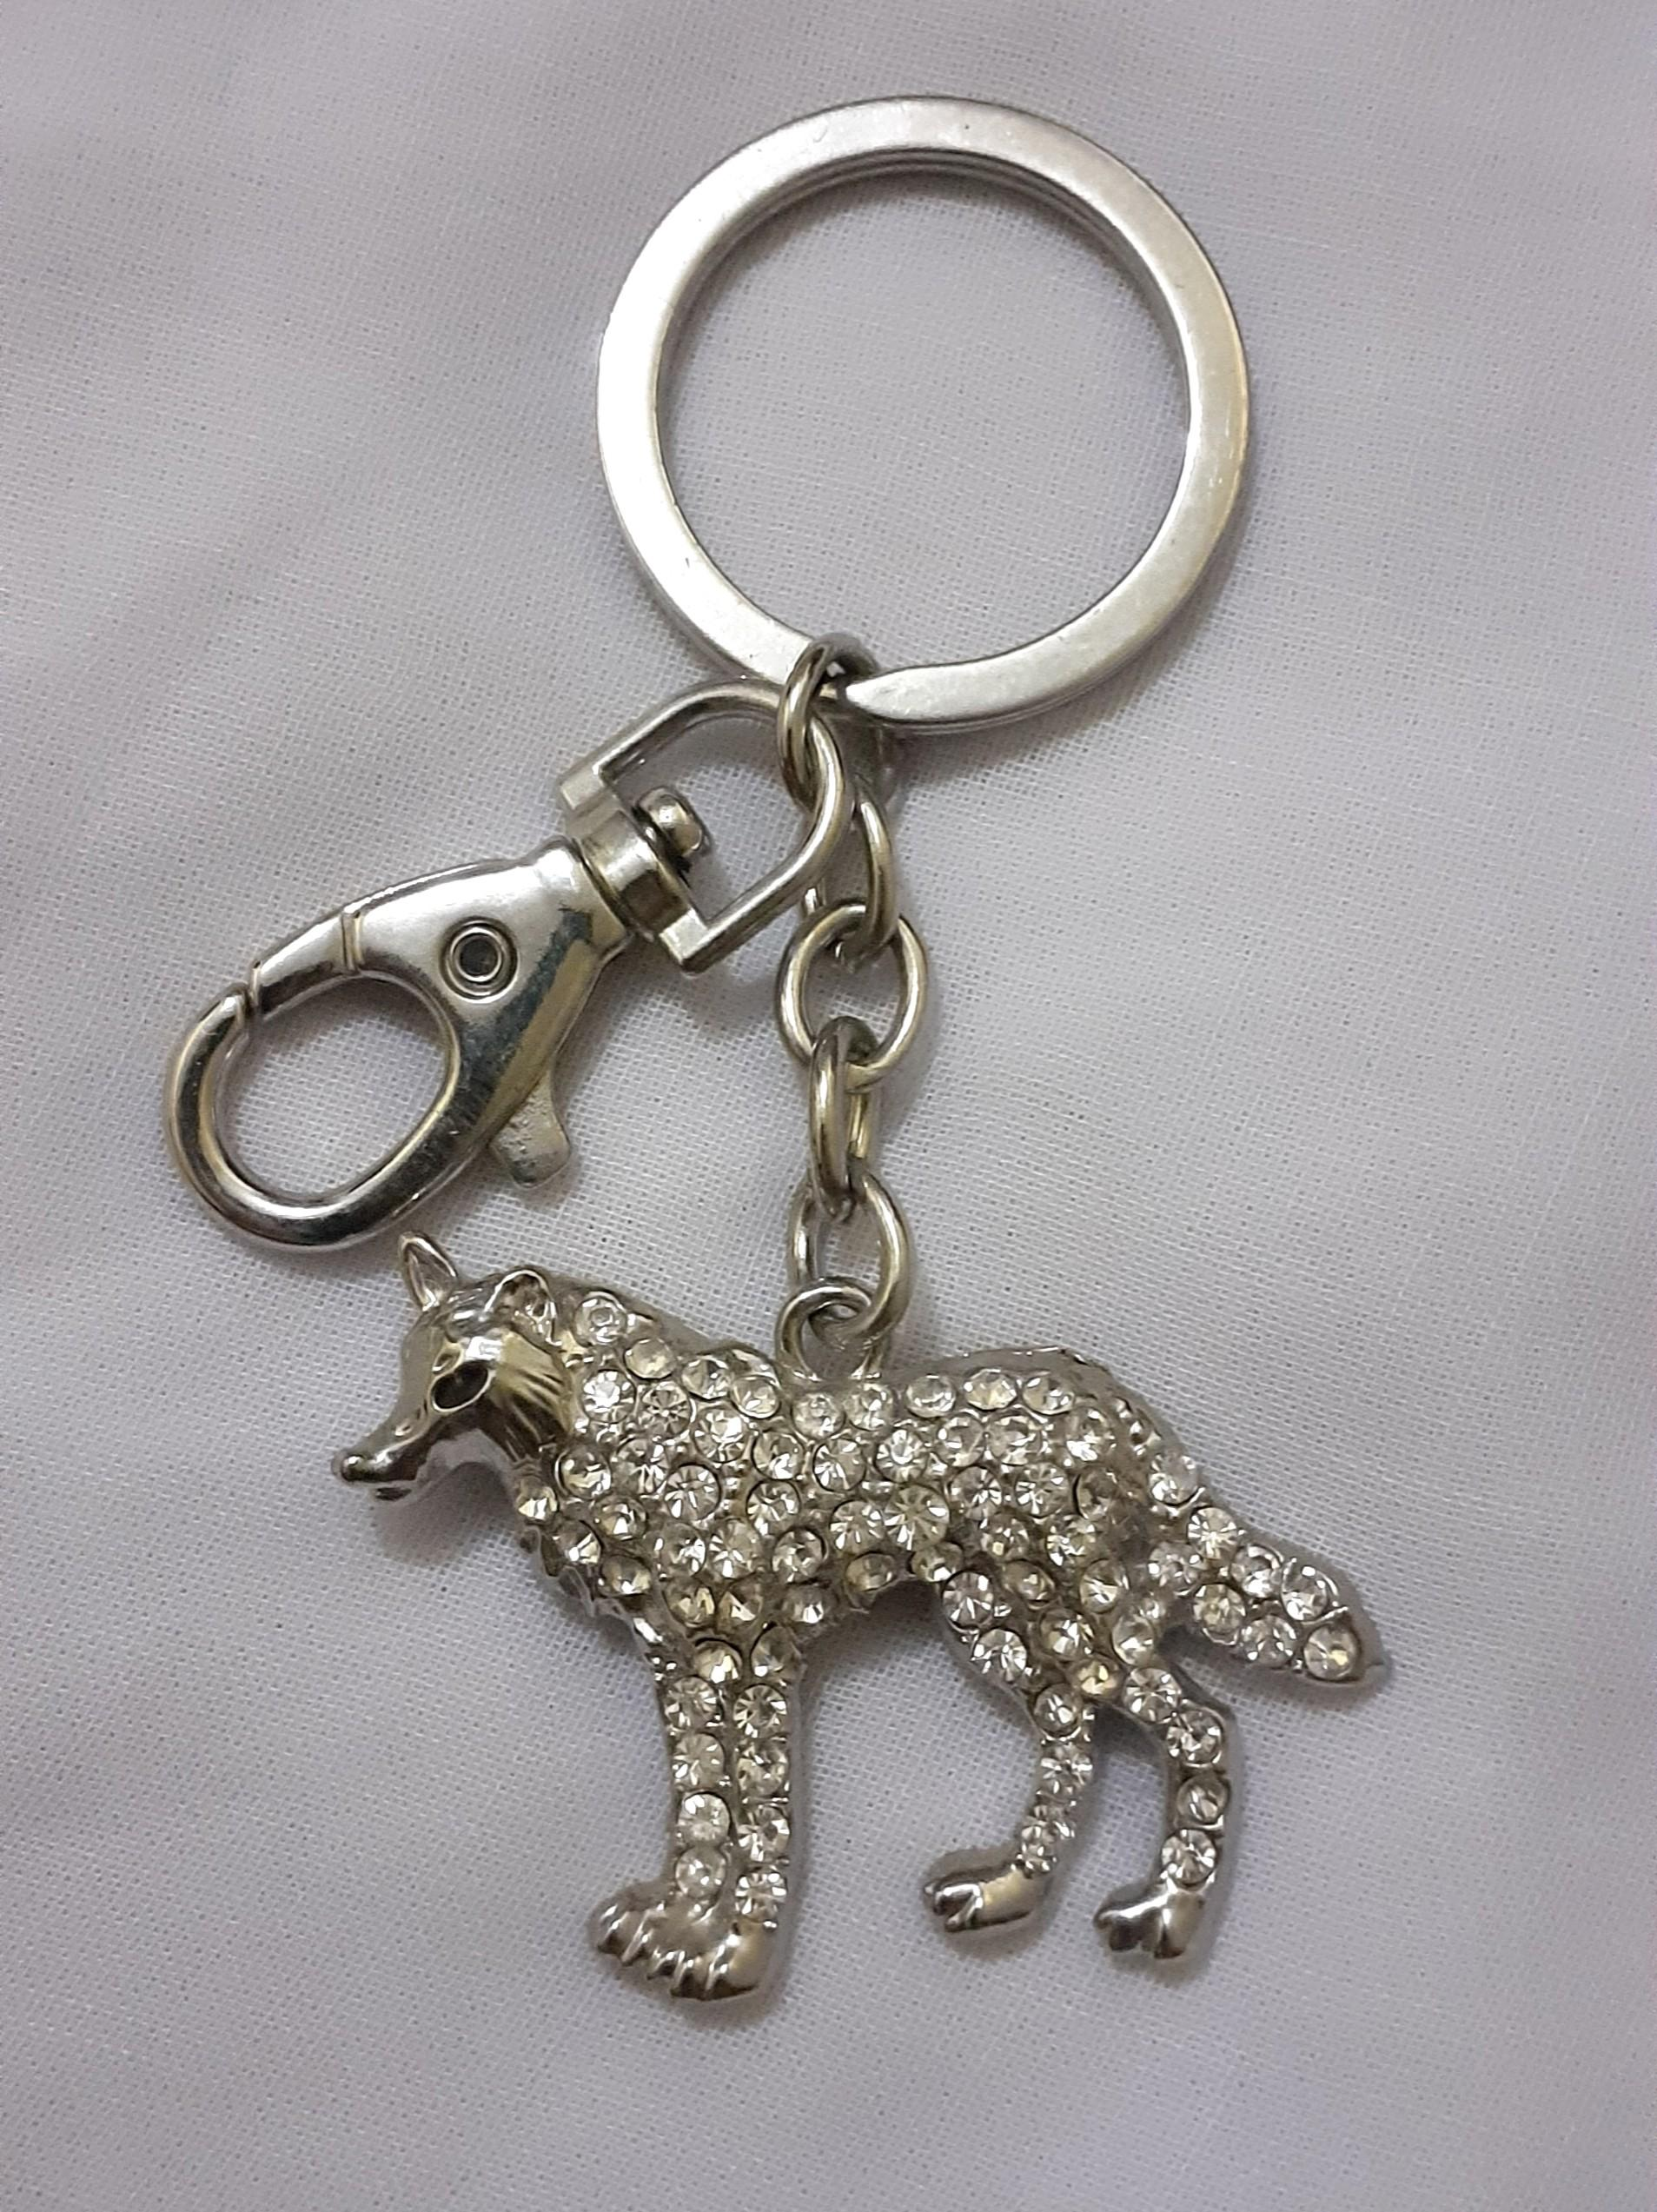 Gantungan Kunci Wolf / Wolf Keychain / Luxury Keychain / Gantungan Tas Murah / Gantungan Kunci Mobil